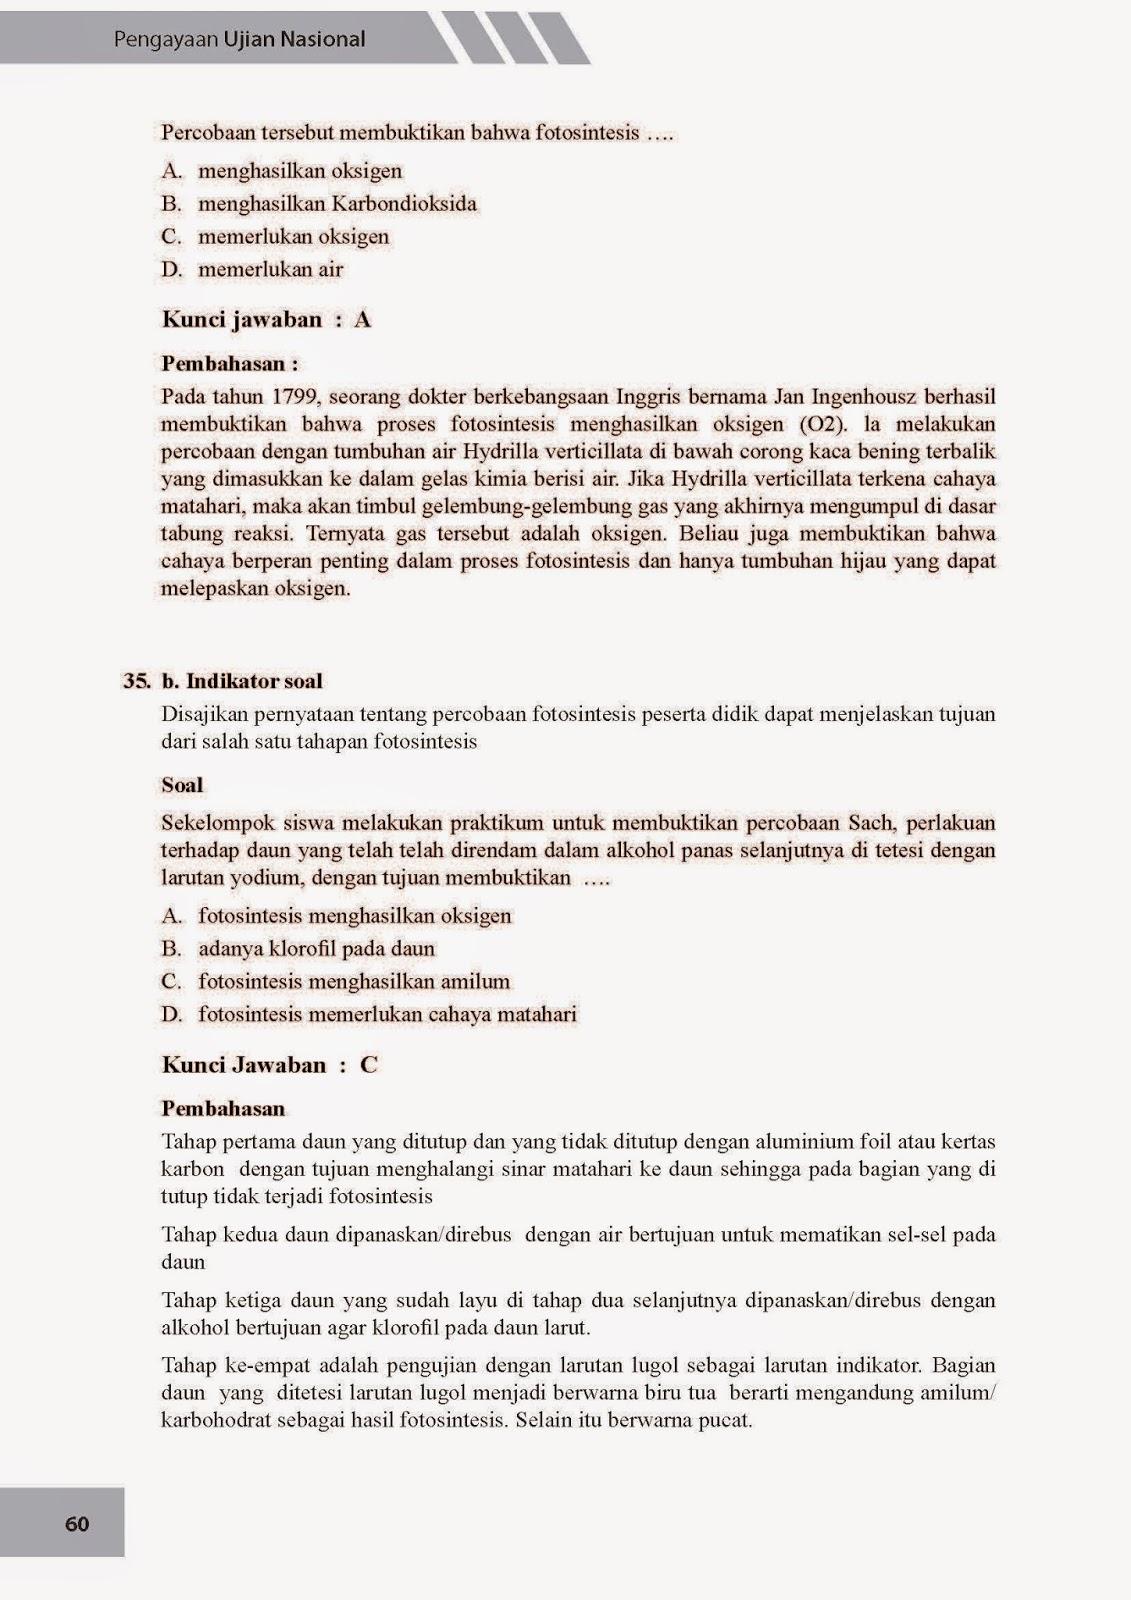 Biologi Gonzaga Prediksi Ujian Nasional Ipa Biologi Smp 2015 85